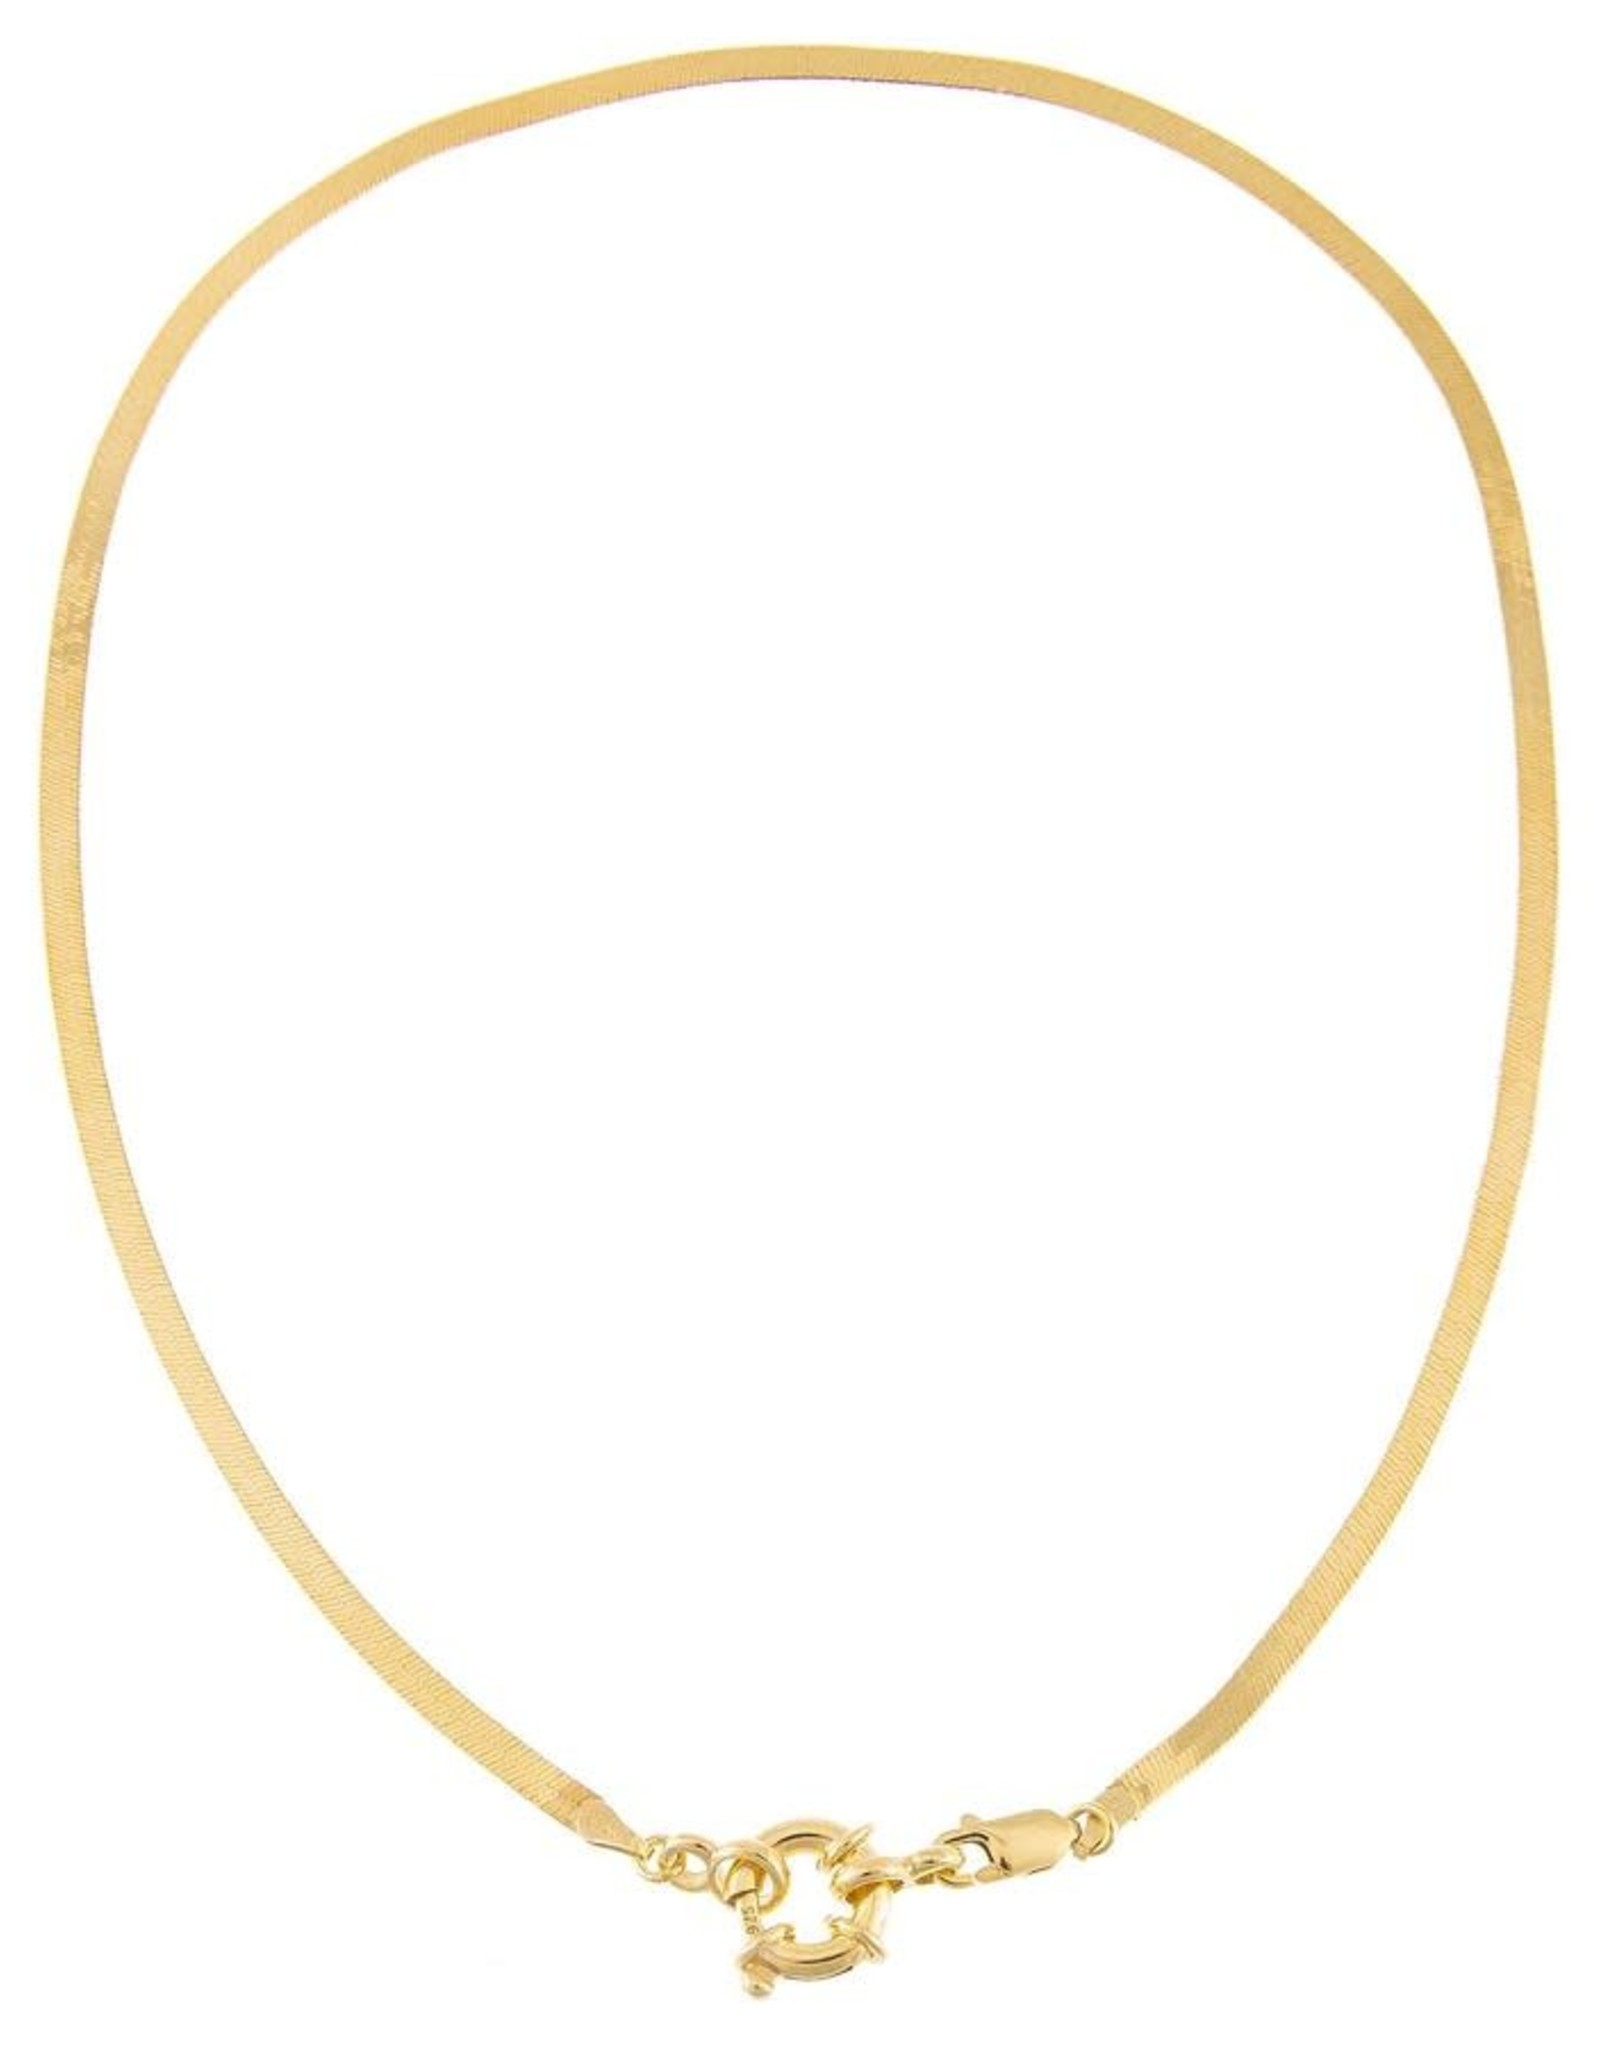 Adinas Toggle Herringbone Necklace